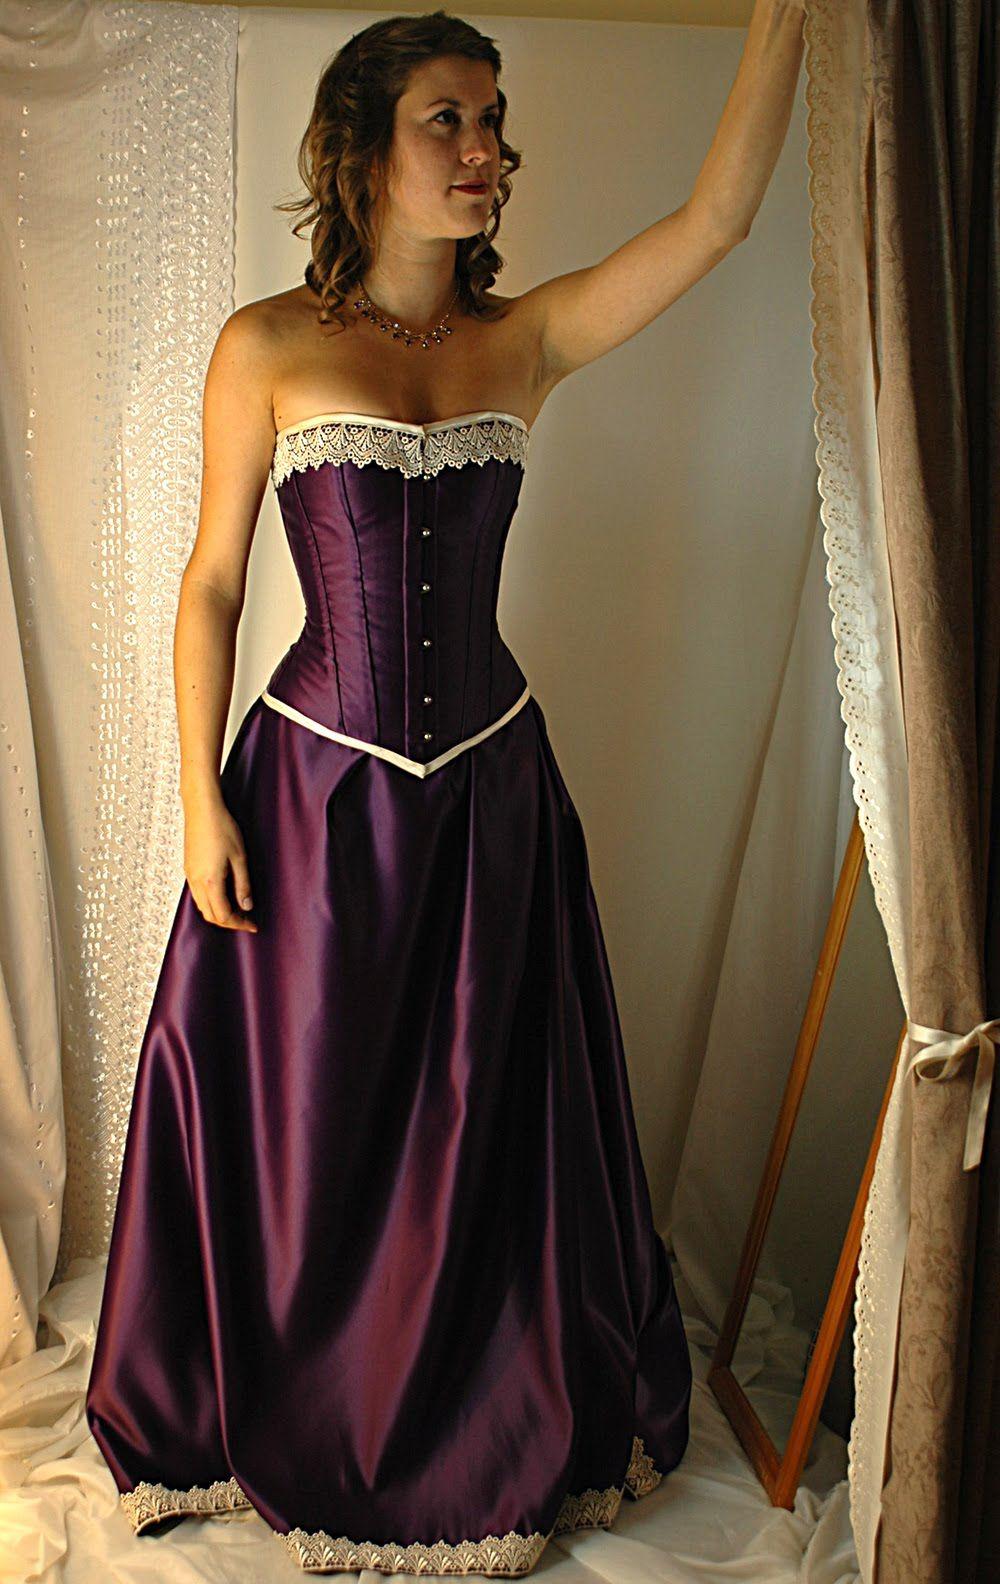 Corset Wedding Dresses Cadbury Purple And Antiqued Ivory Steel Boned Gown